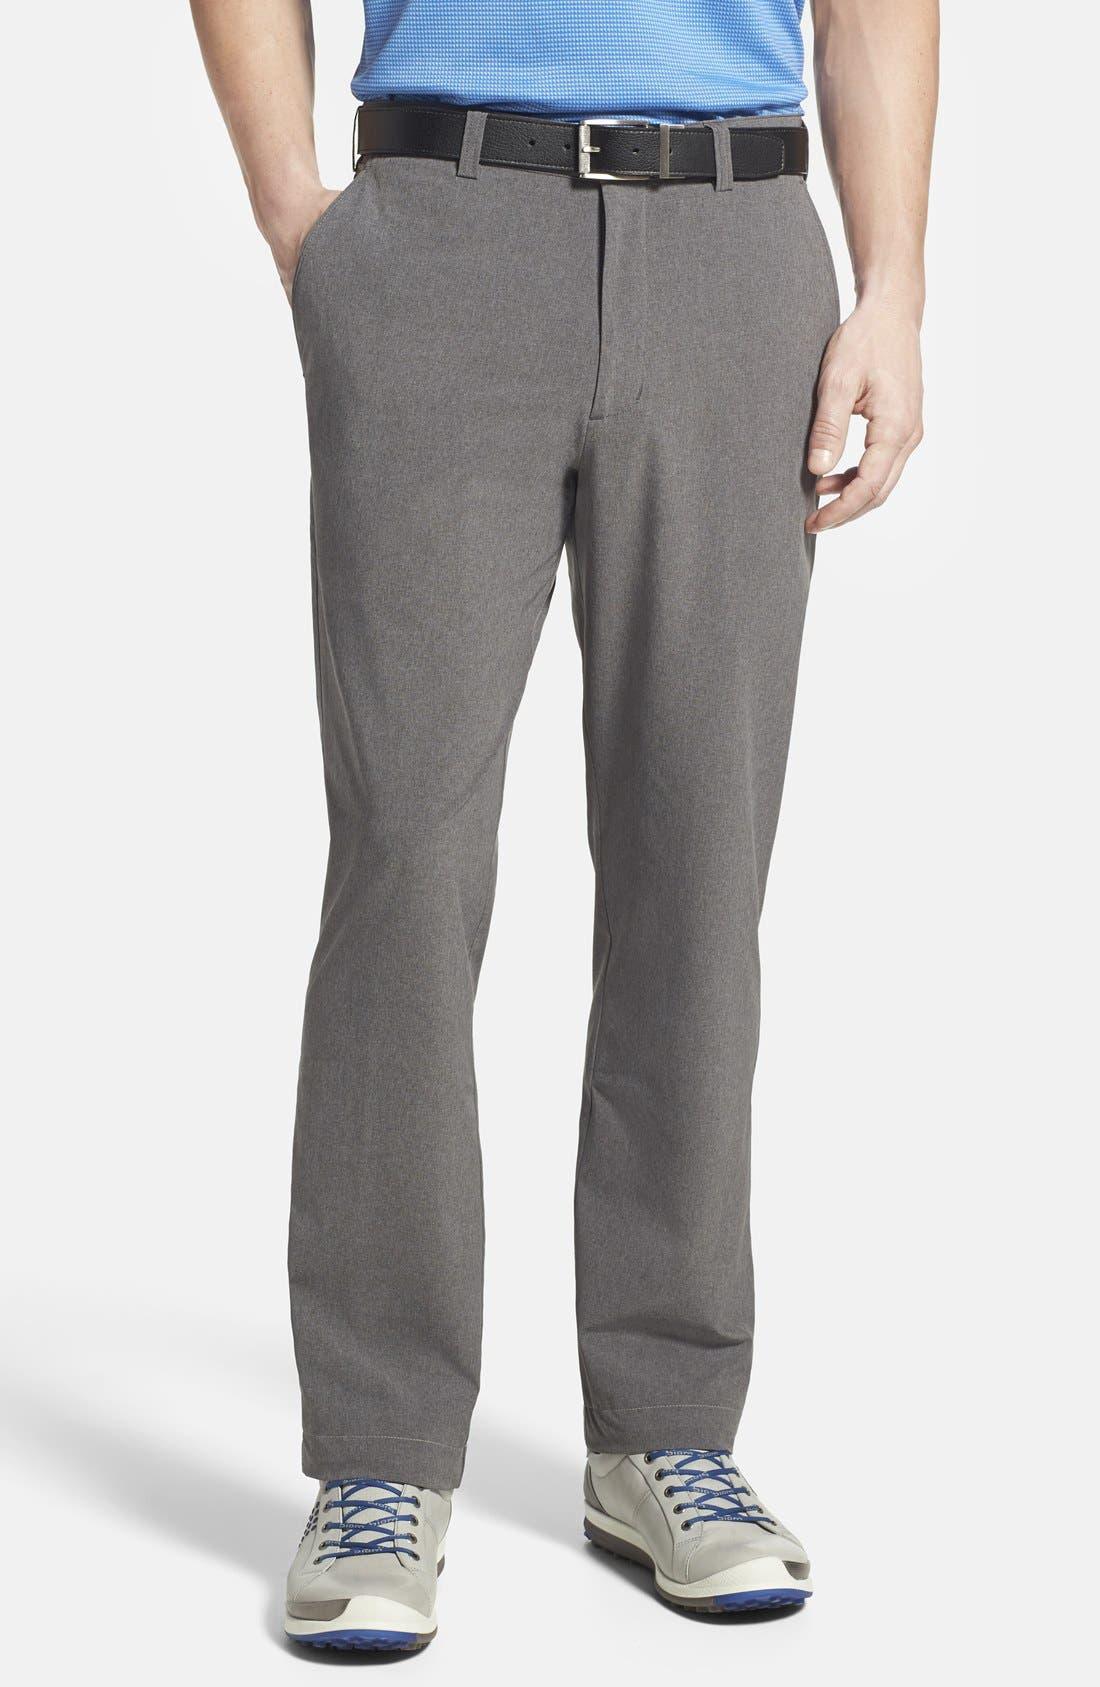 CUTTER & BUCK 'Bainbridge' DryTec Flat Front Pants, Main, color, IRON GREY